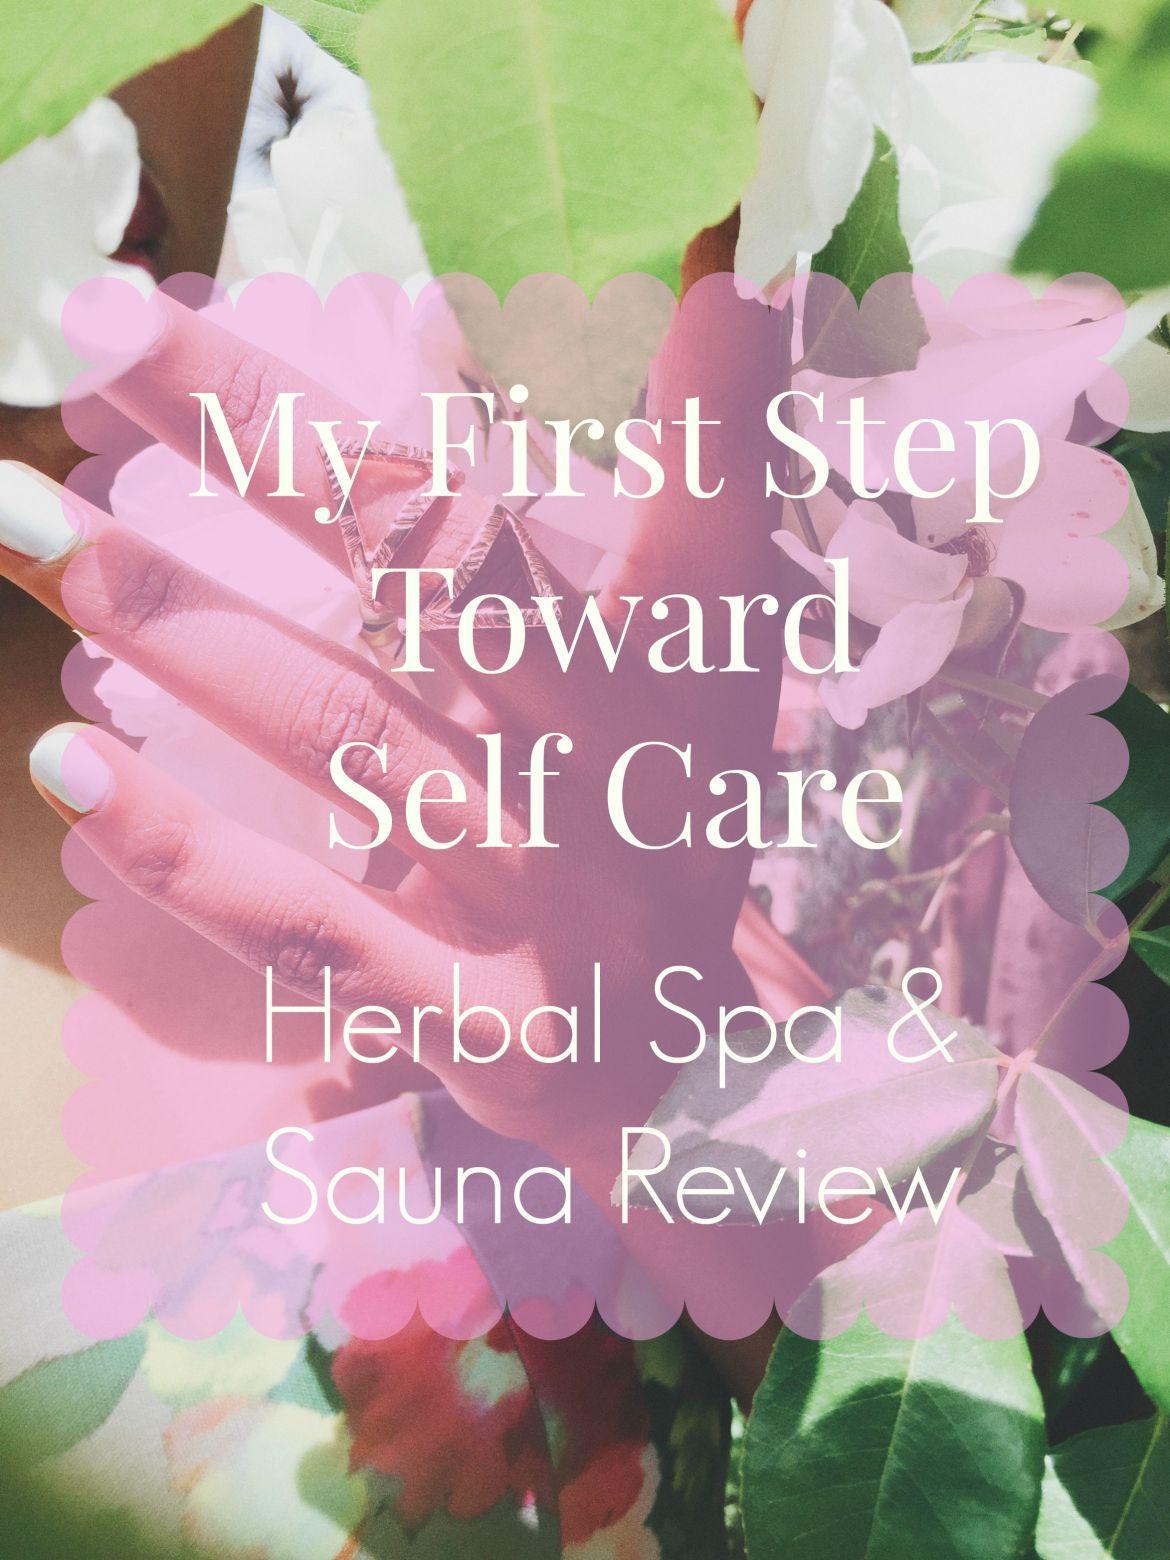 self care, herbal spa review,